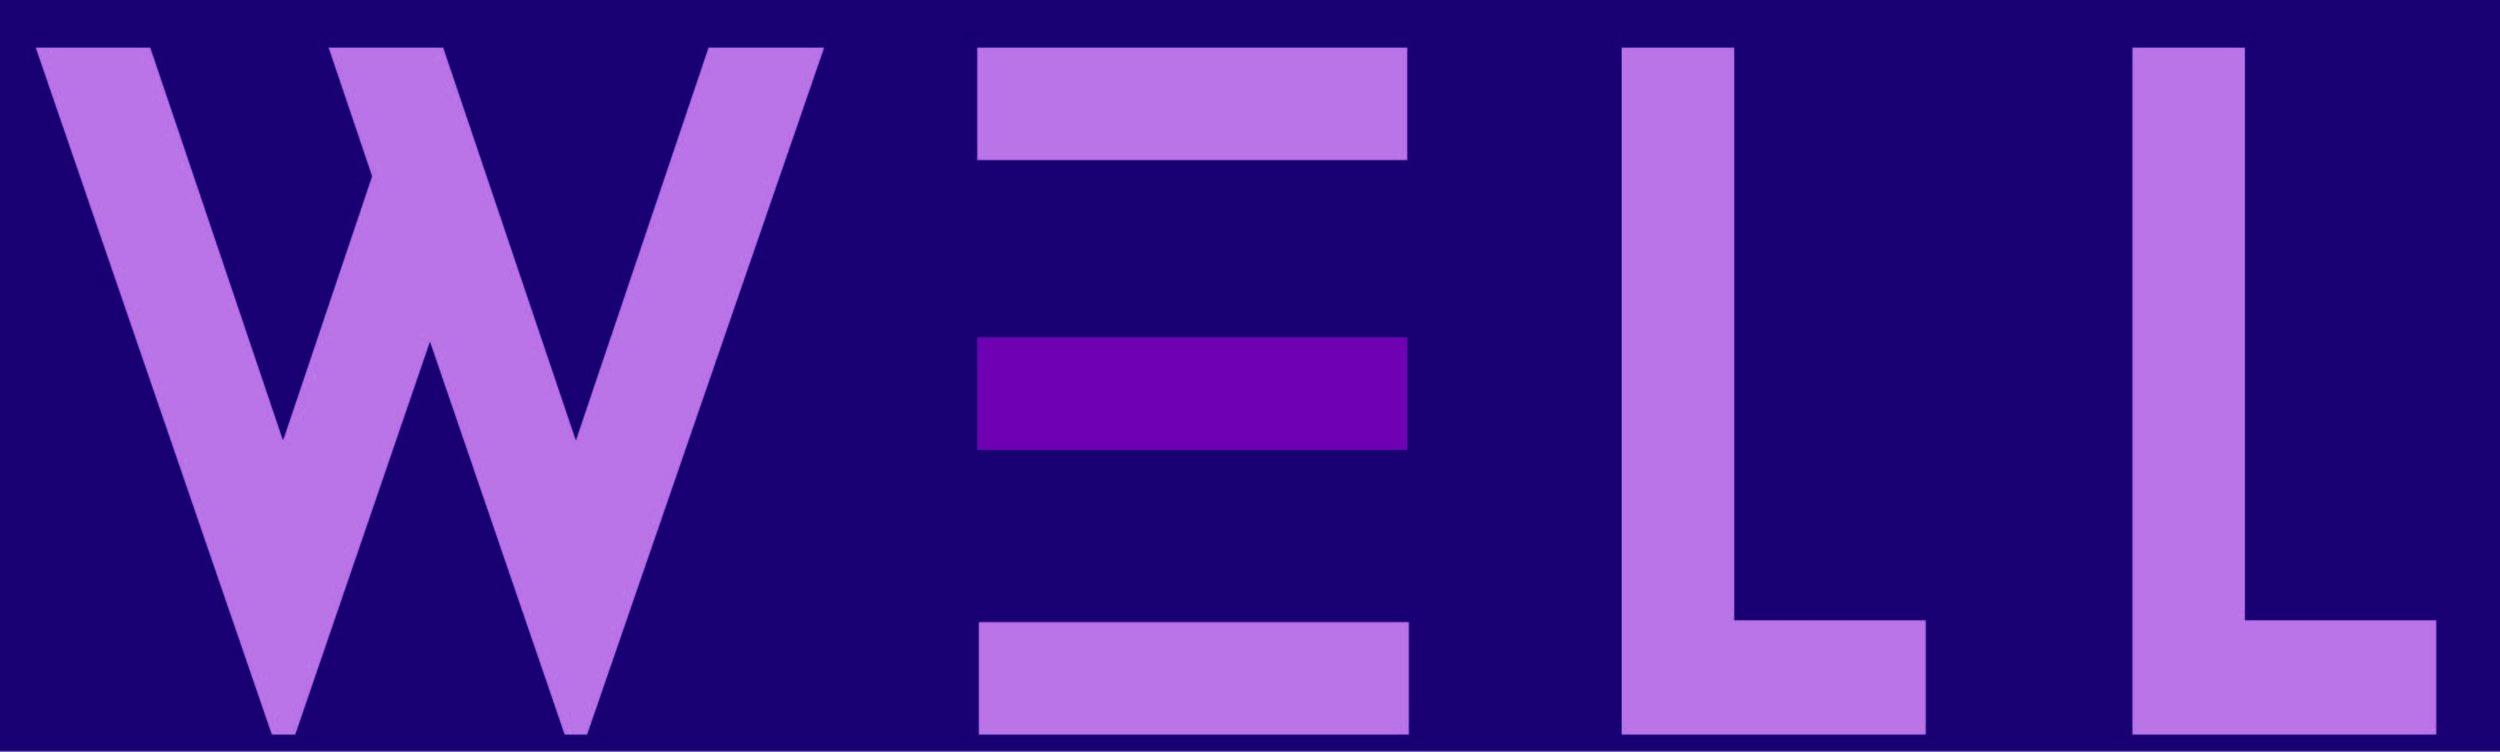 Purple and lavender.jpg